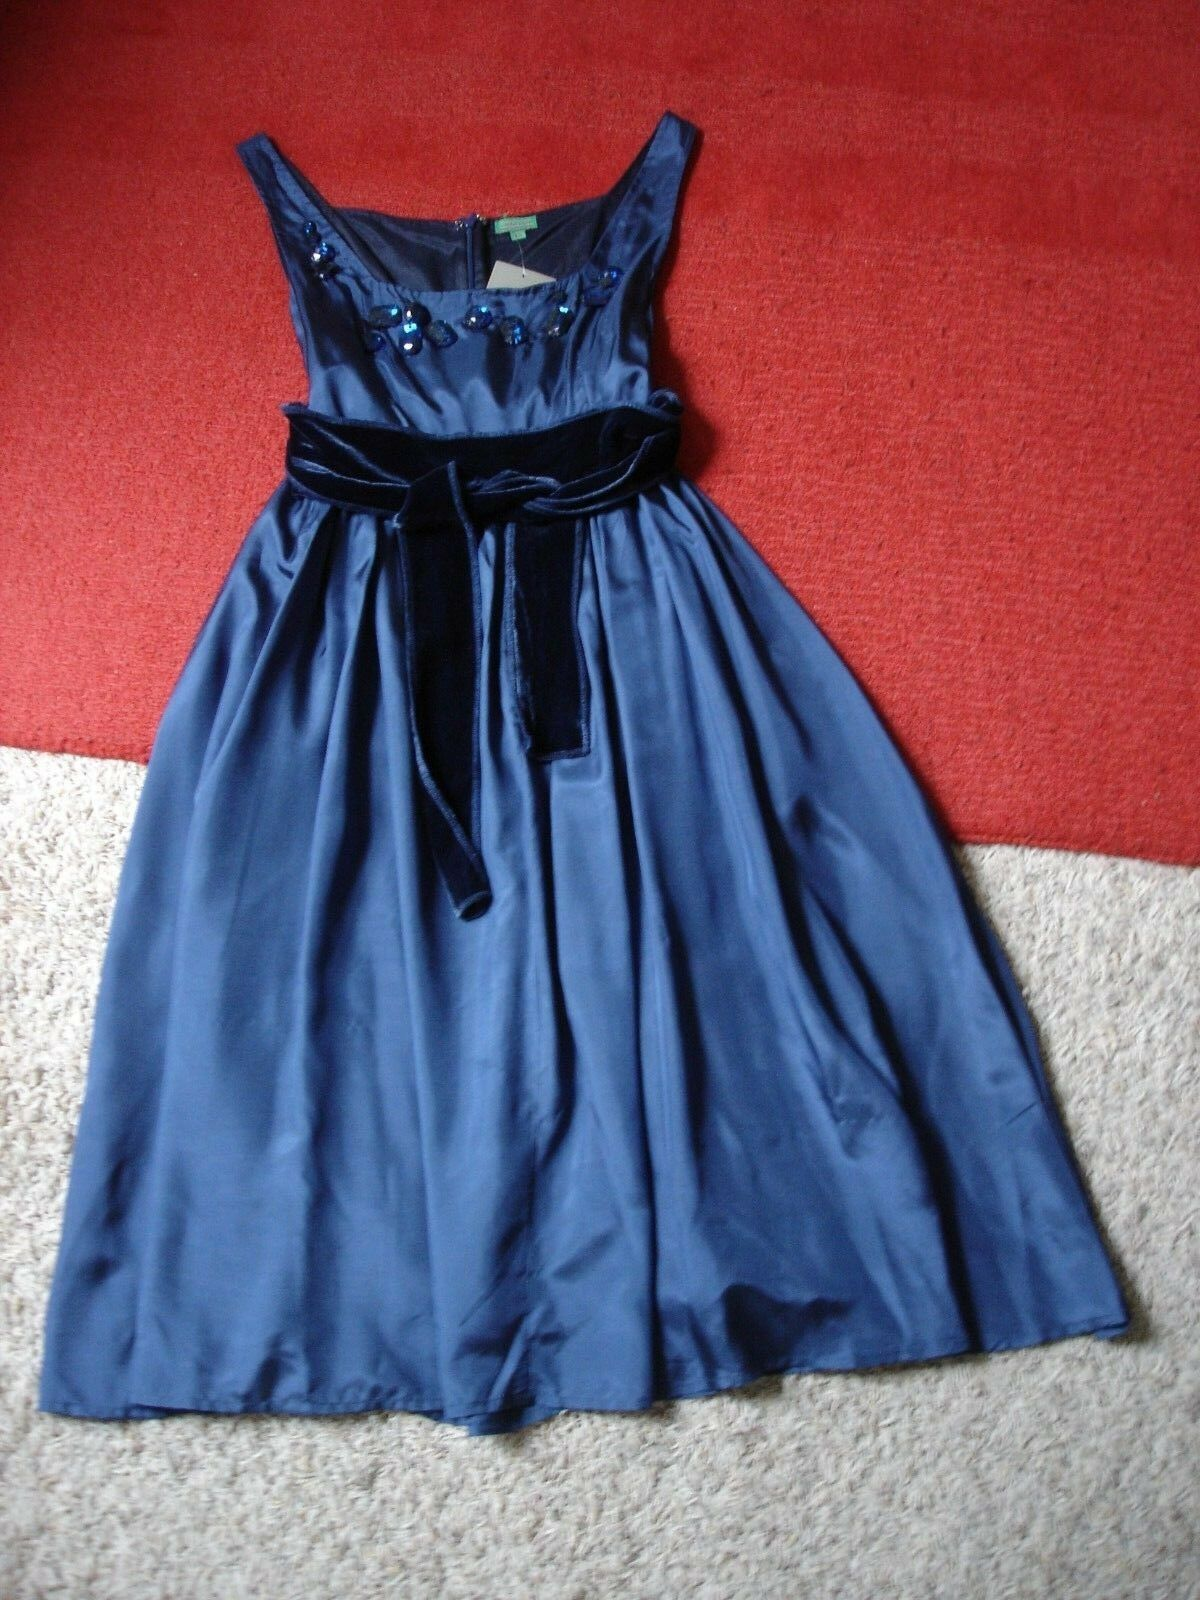 NWT Chan Luu 100% Silk Faux Gem Embellished Evening Sleeveless Tank Dress XS NEW